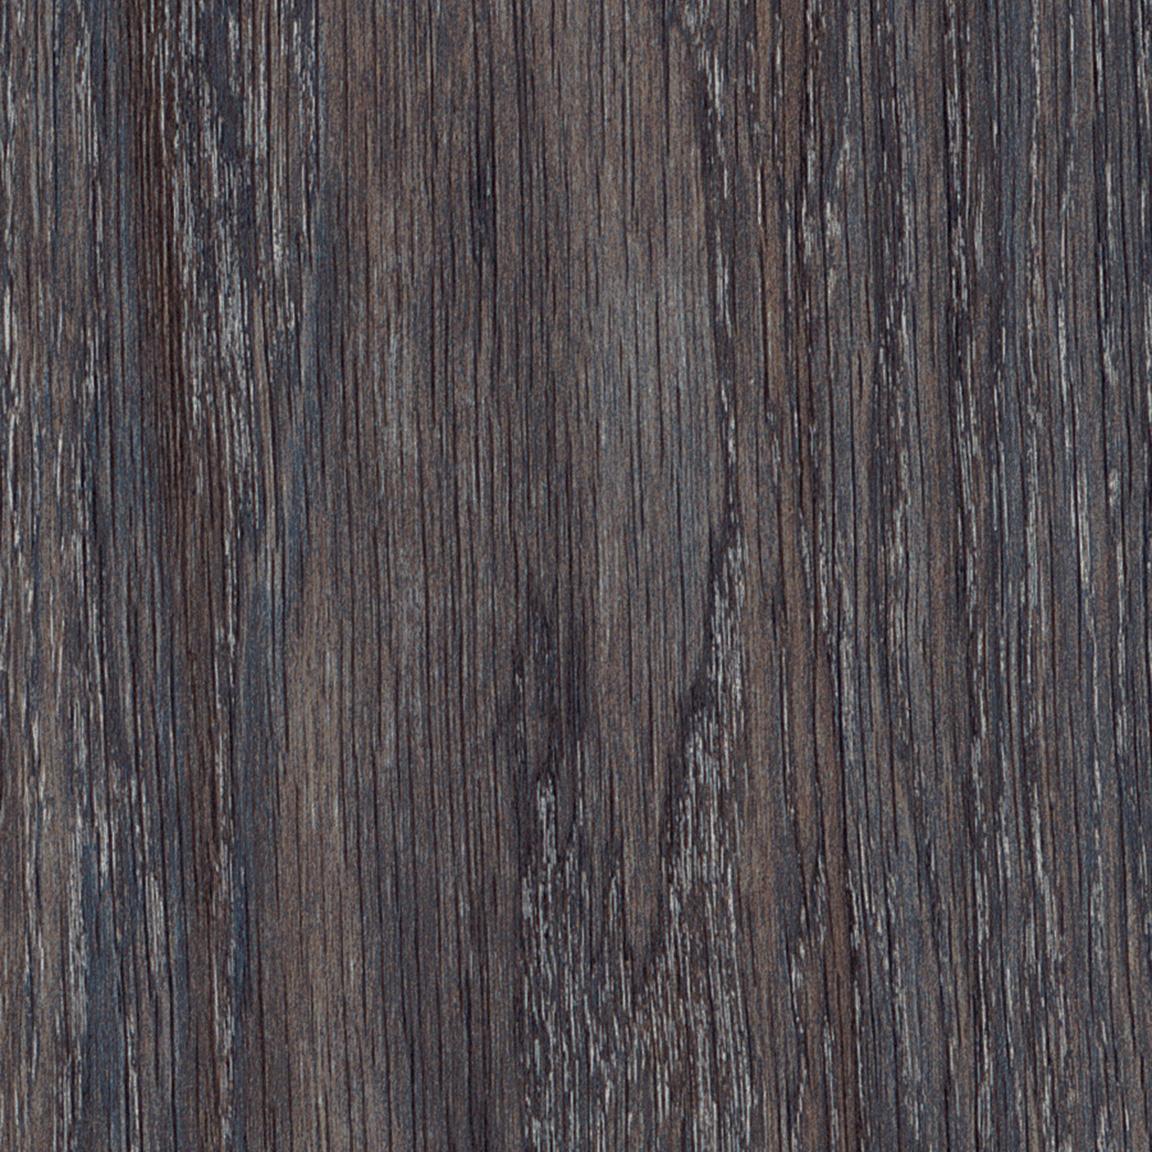 Galleon Oak tile